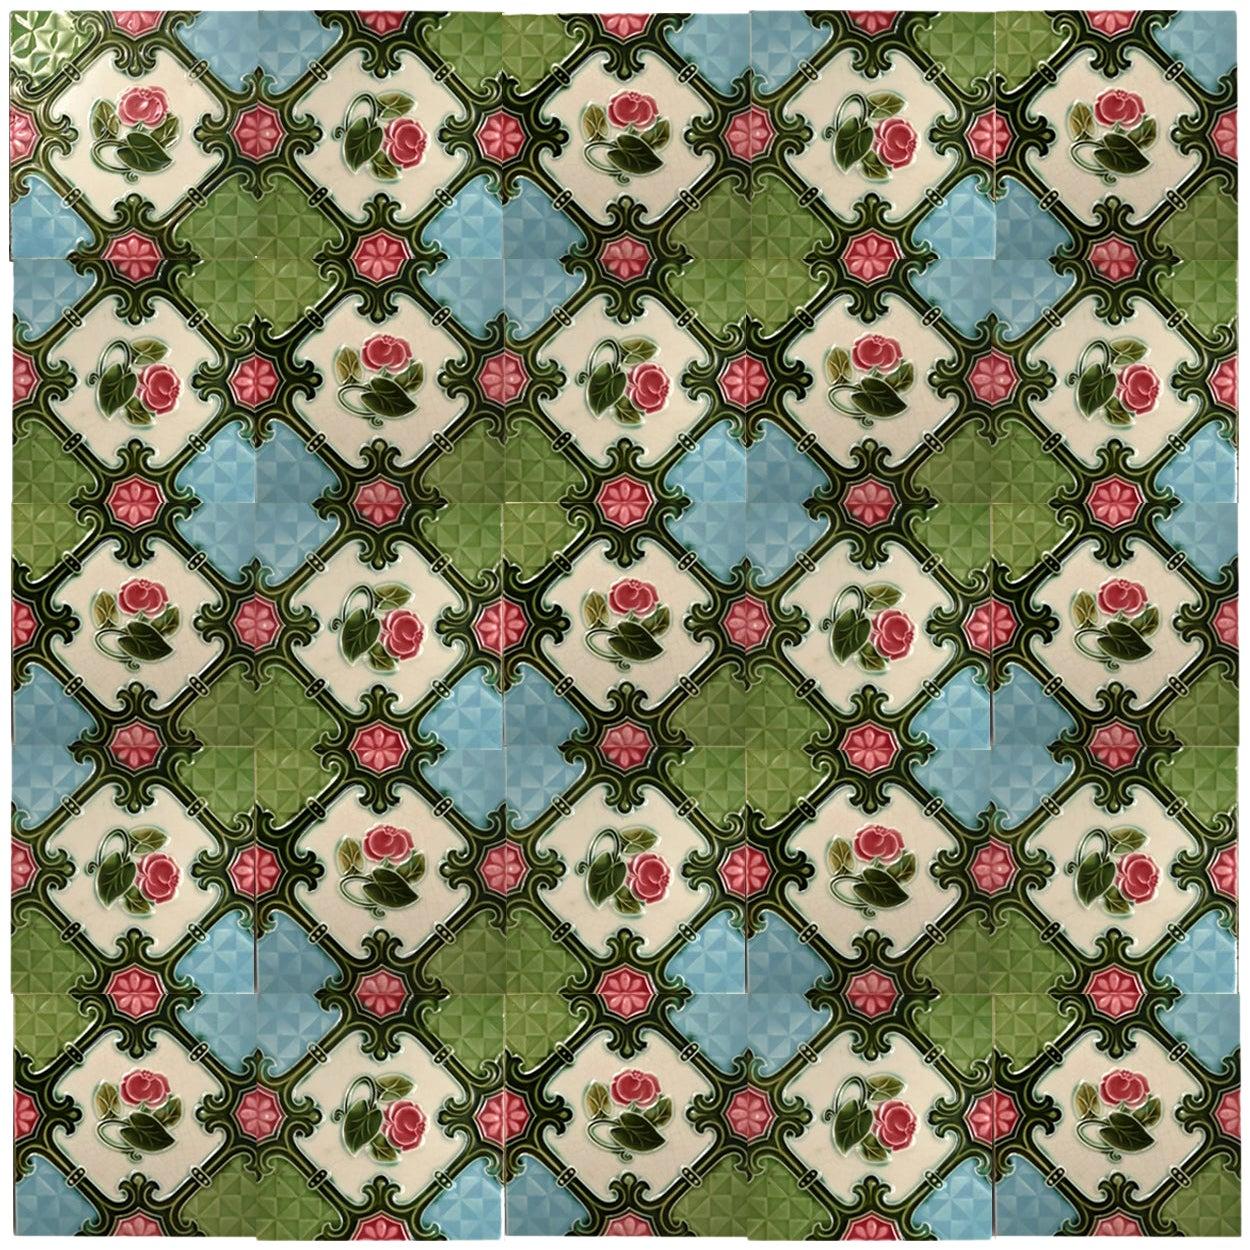 1 of the 24 Authentic Glazed Art Nouveau Relief Tiles Rose, Belga, circa 1930s